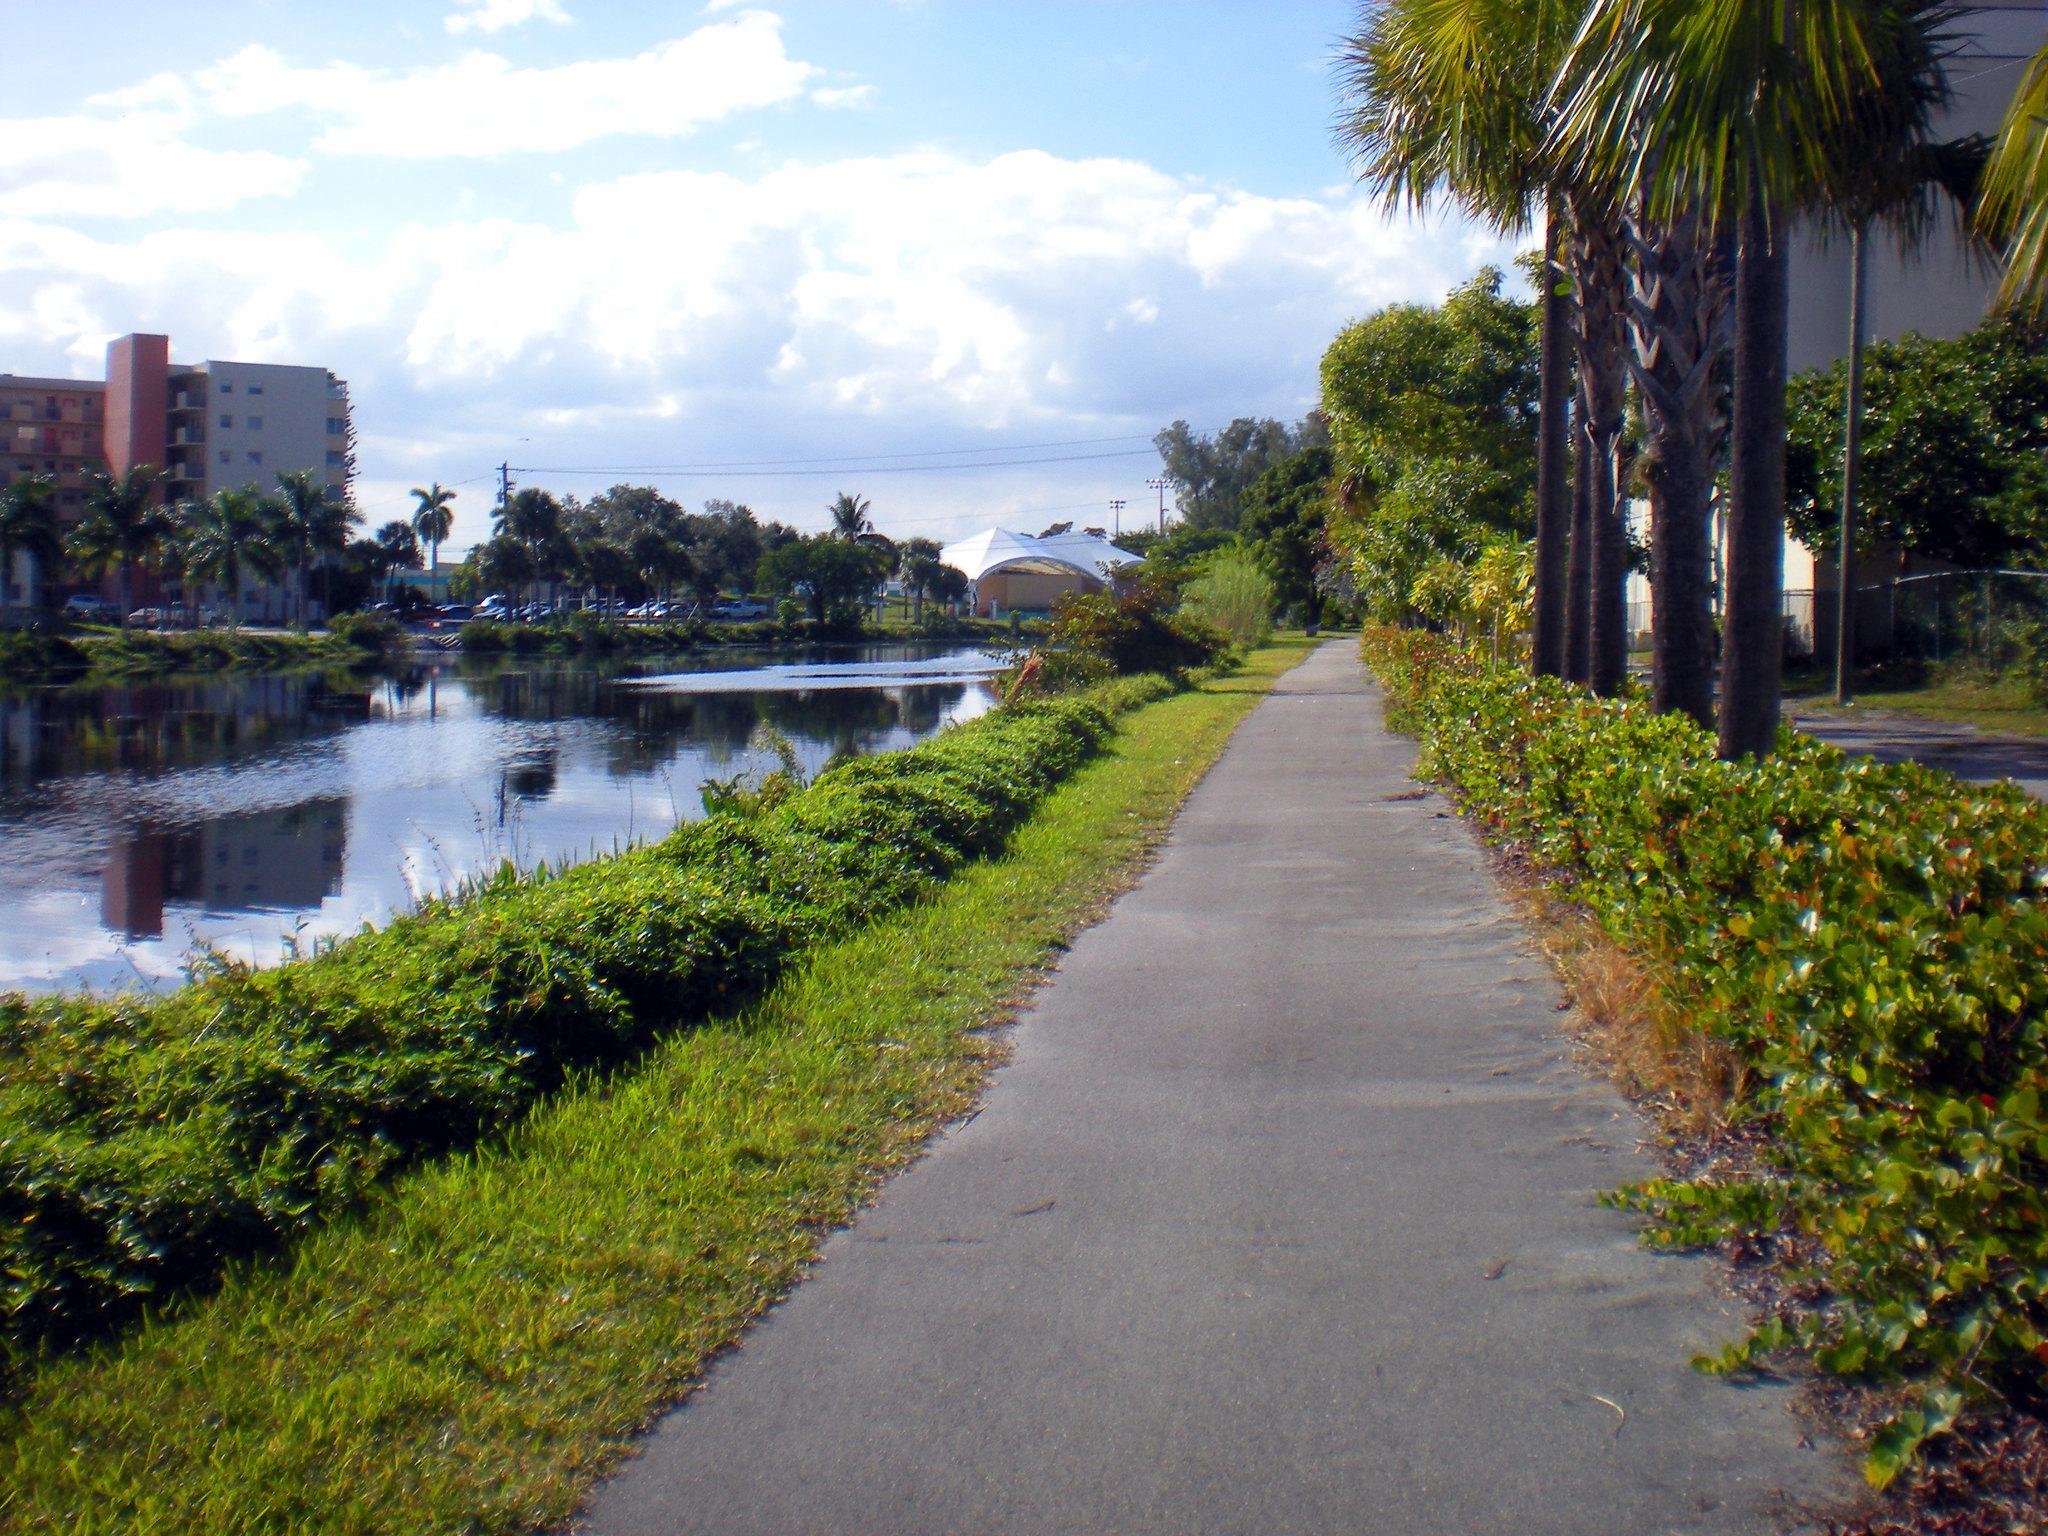 Snake Creek Trail, Hiking Miami